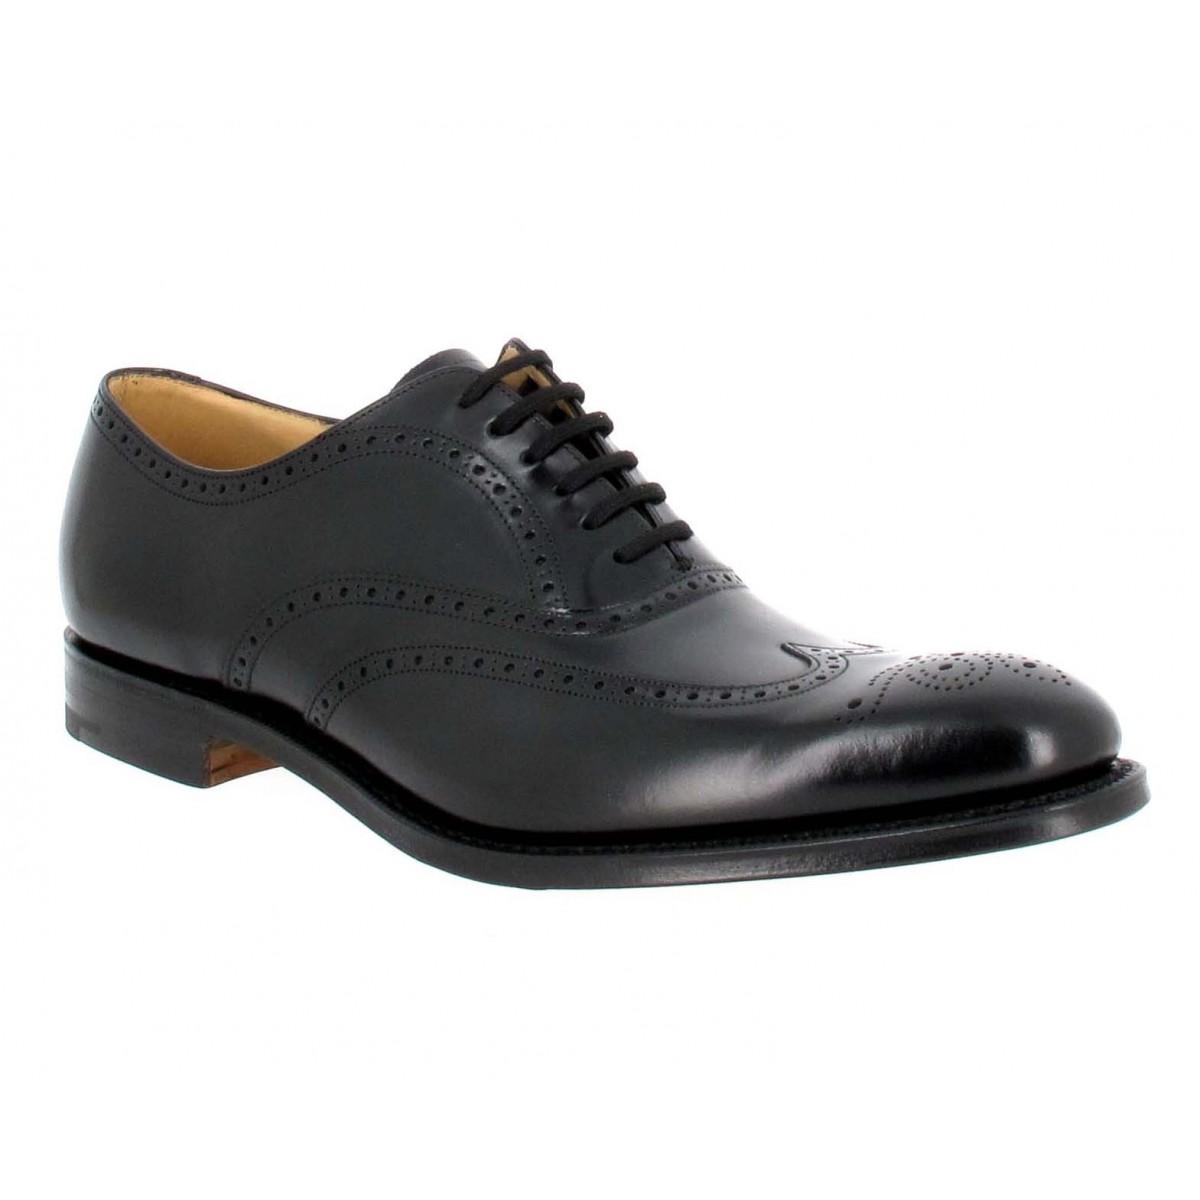 Chaussures à lacets CHURCH'S New York cuir Homme Noir